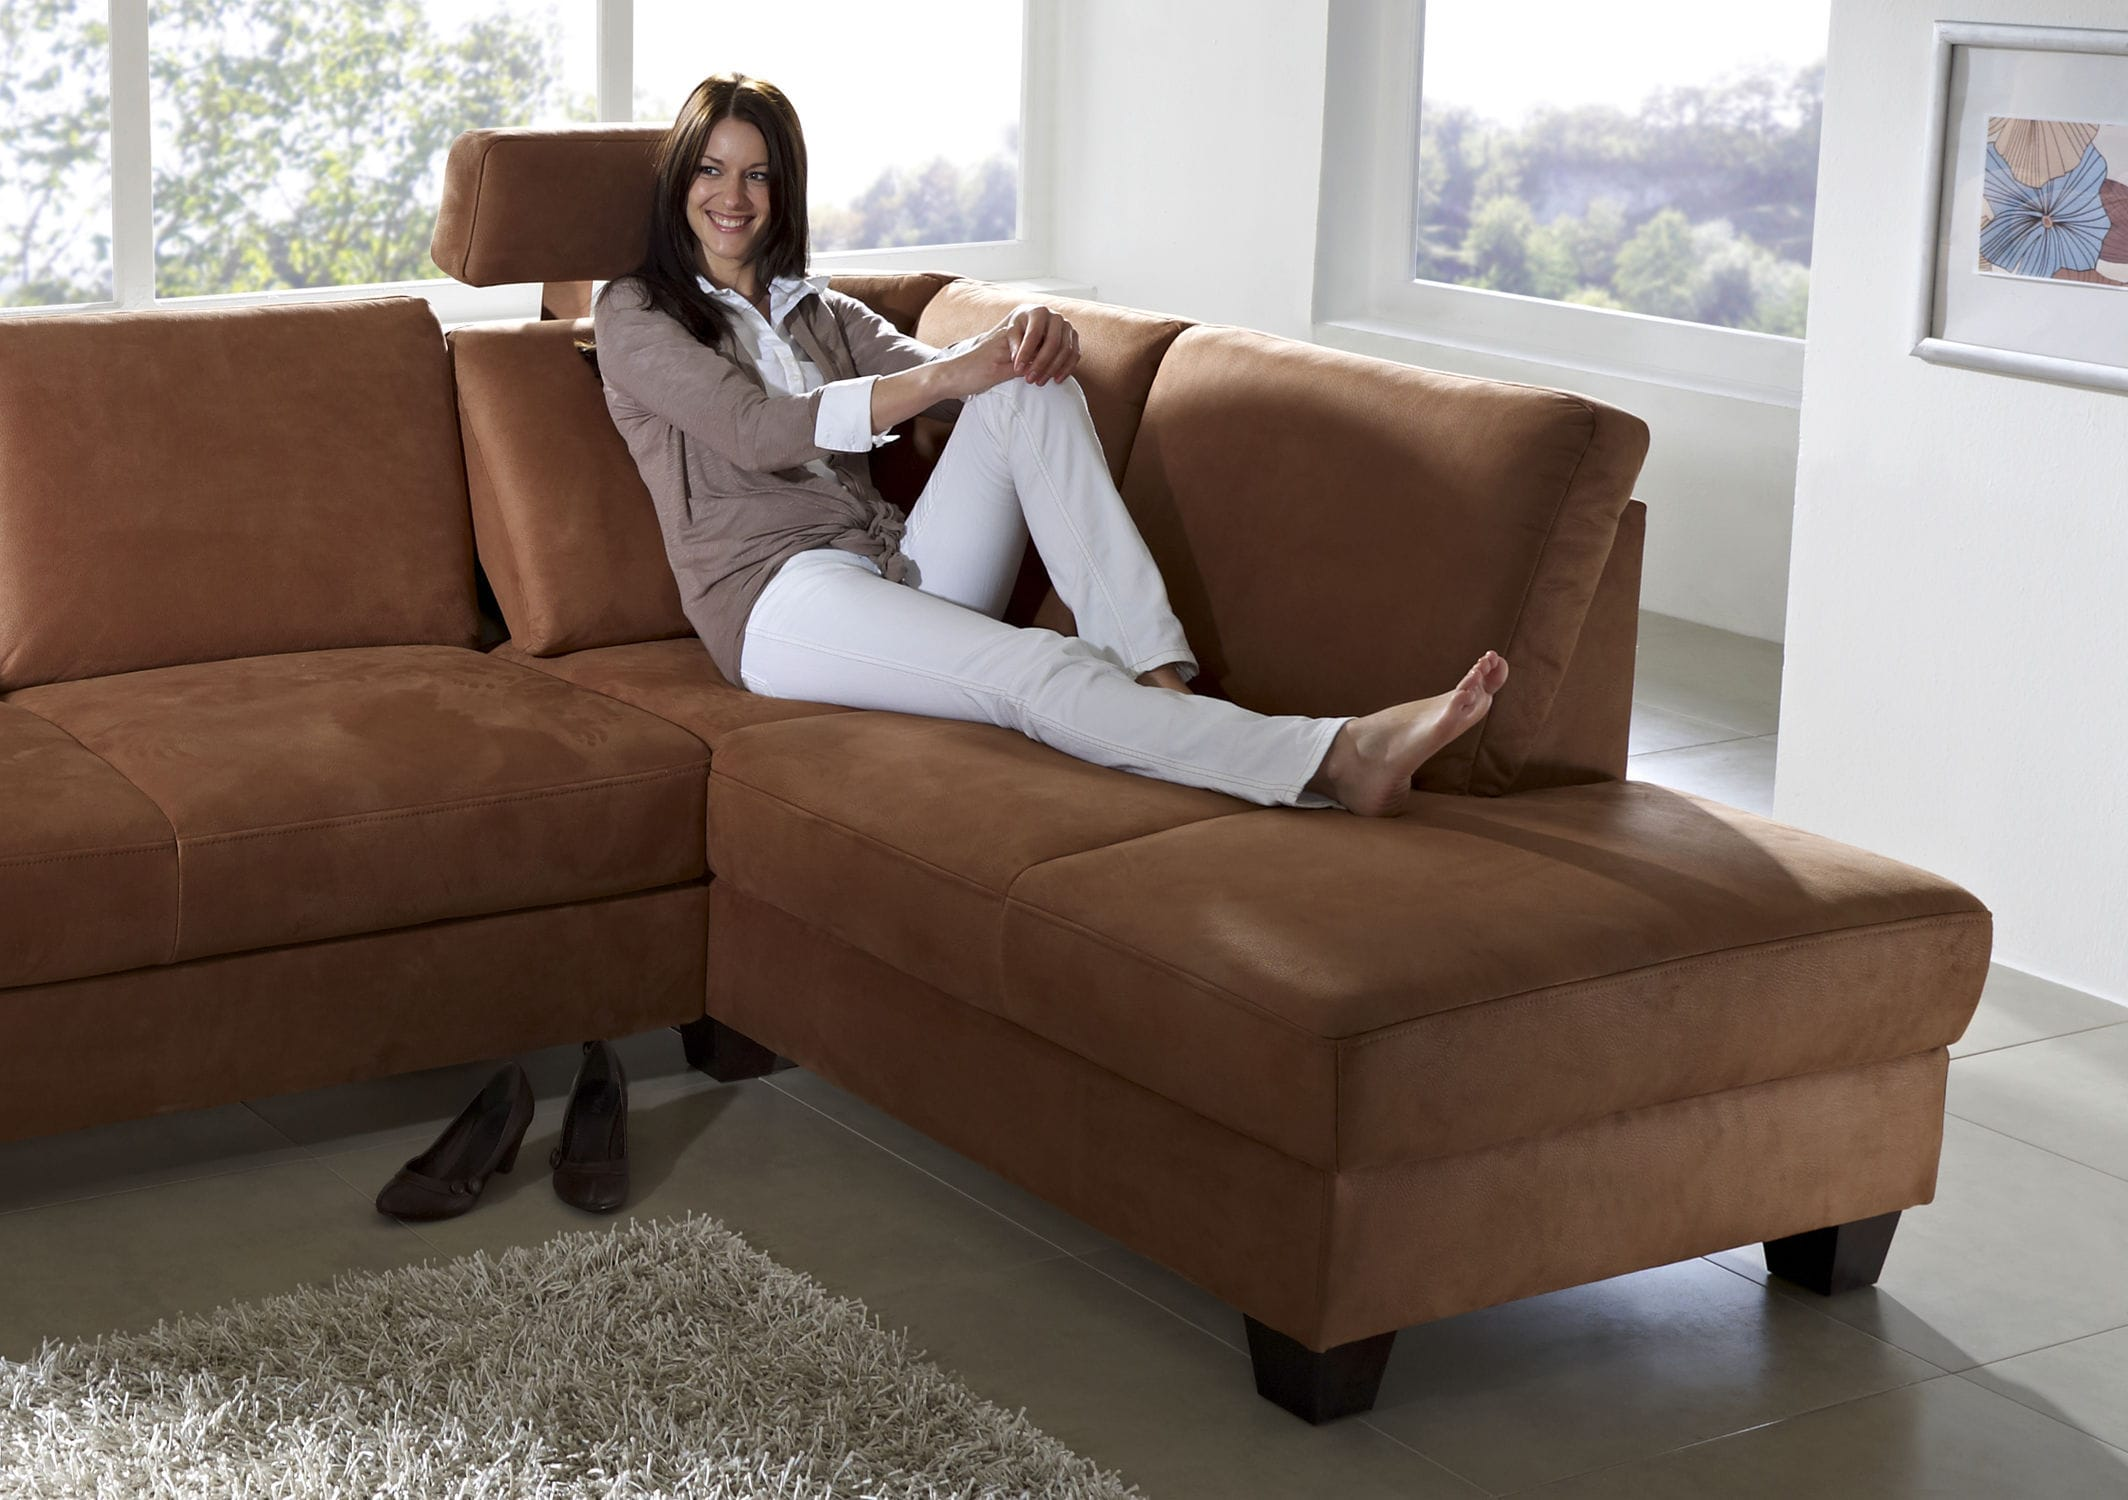 Modular sofa contemporary leather 4 seater CHALET BOZEN